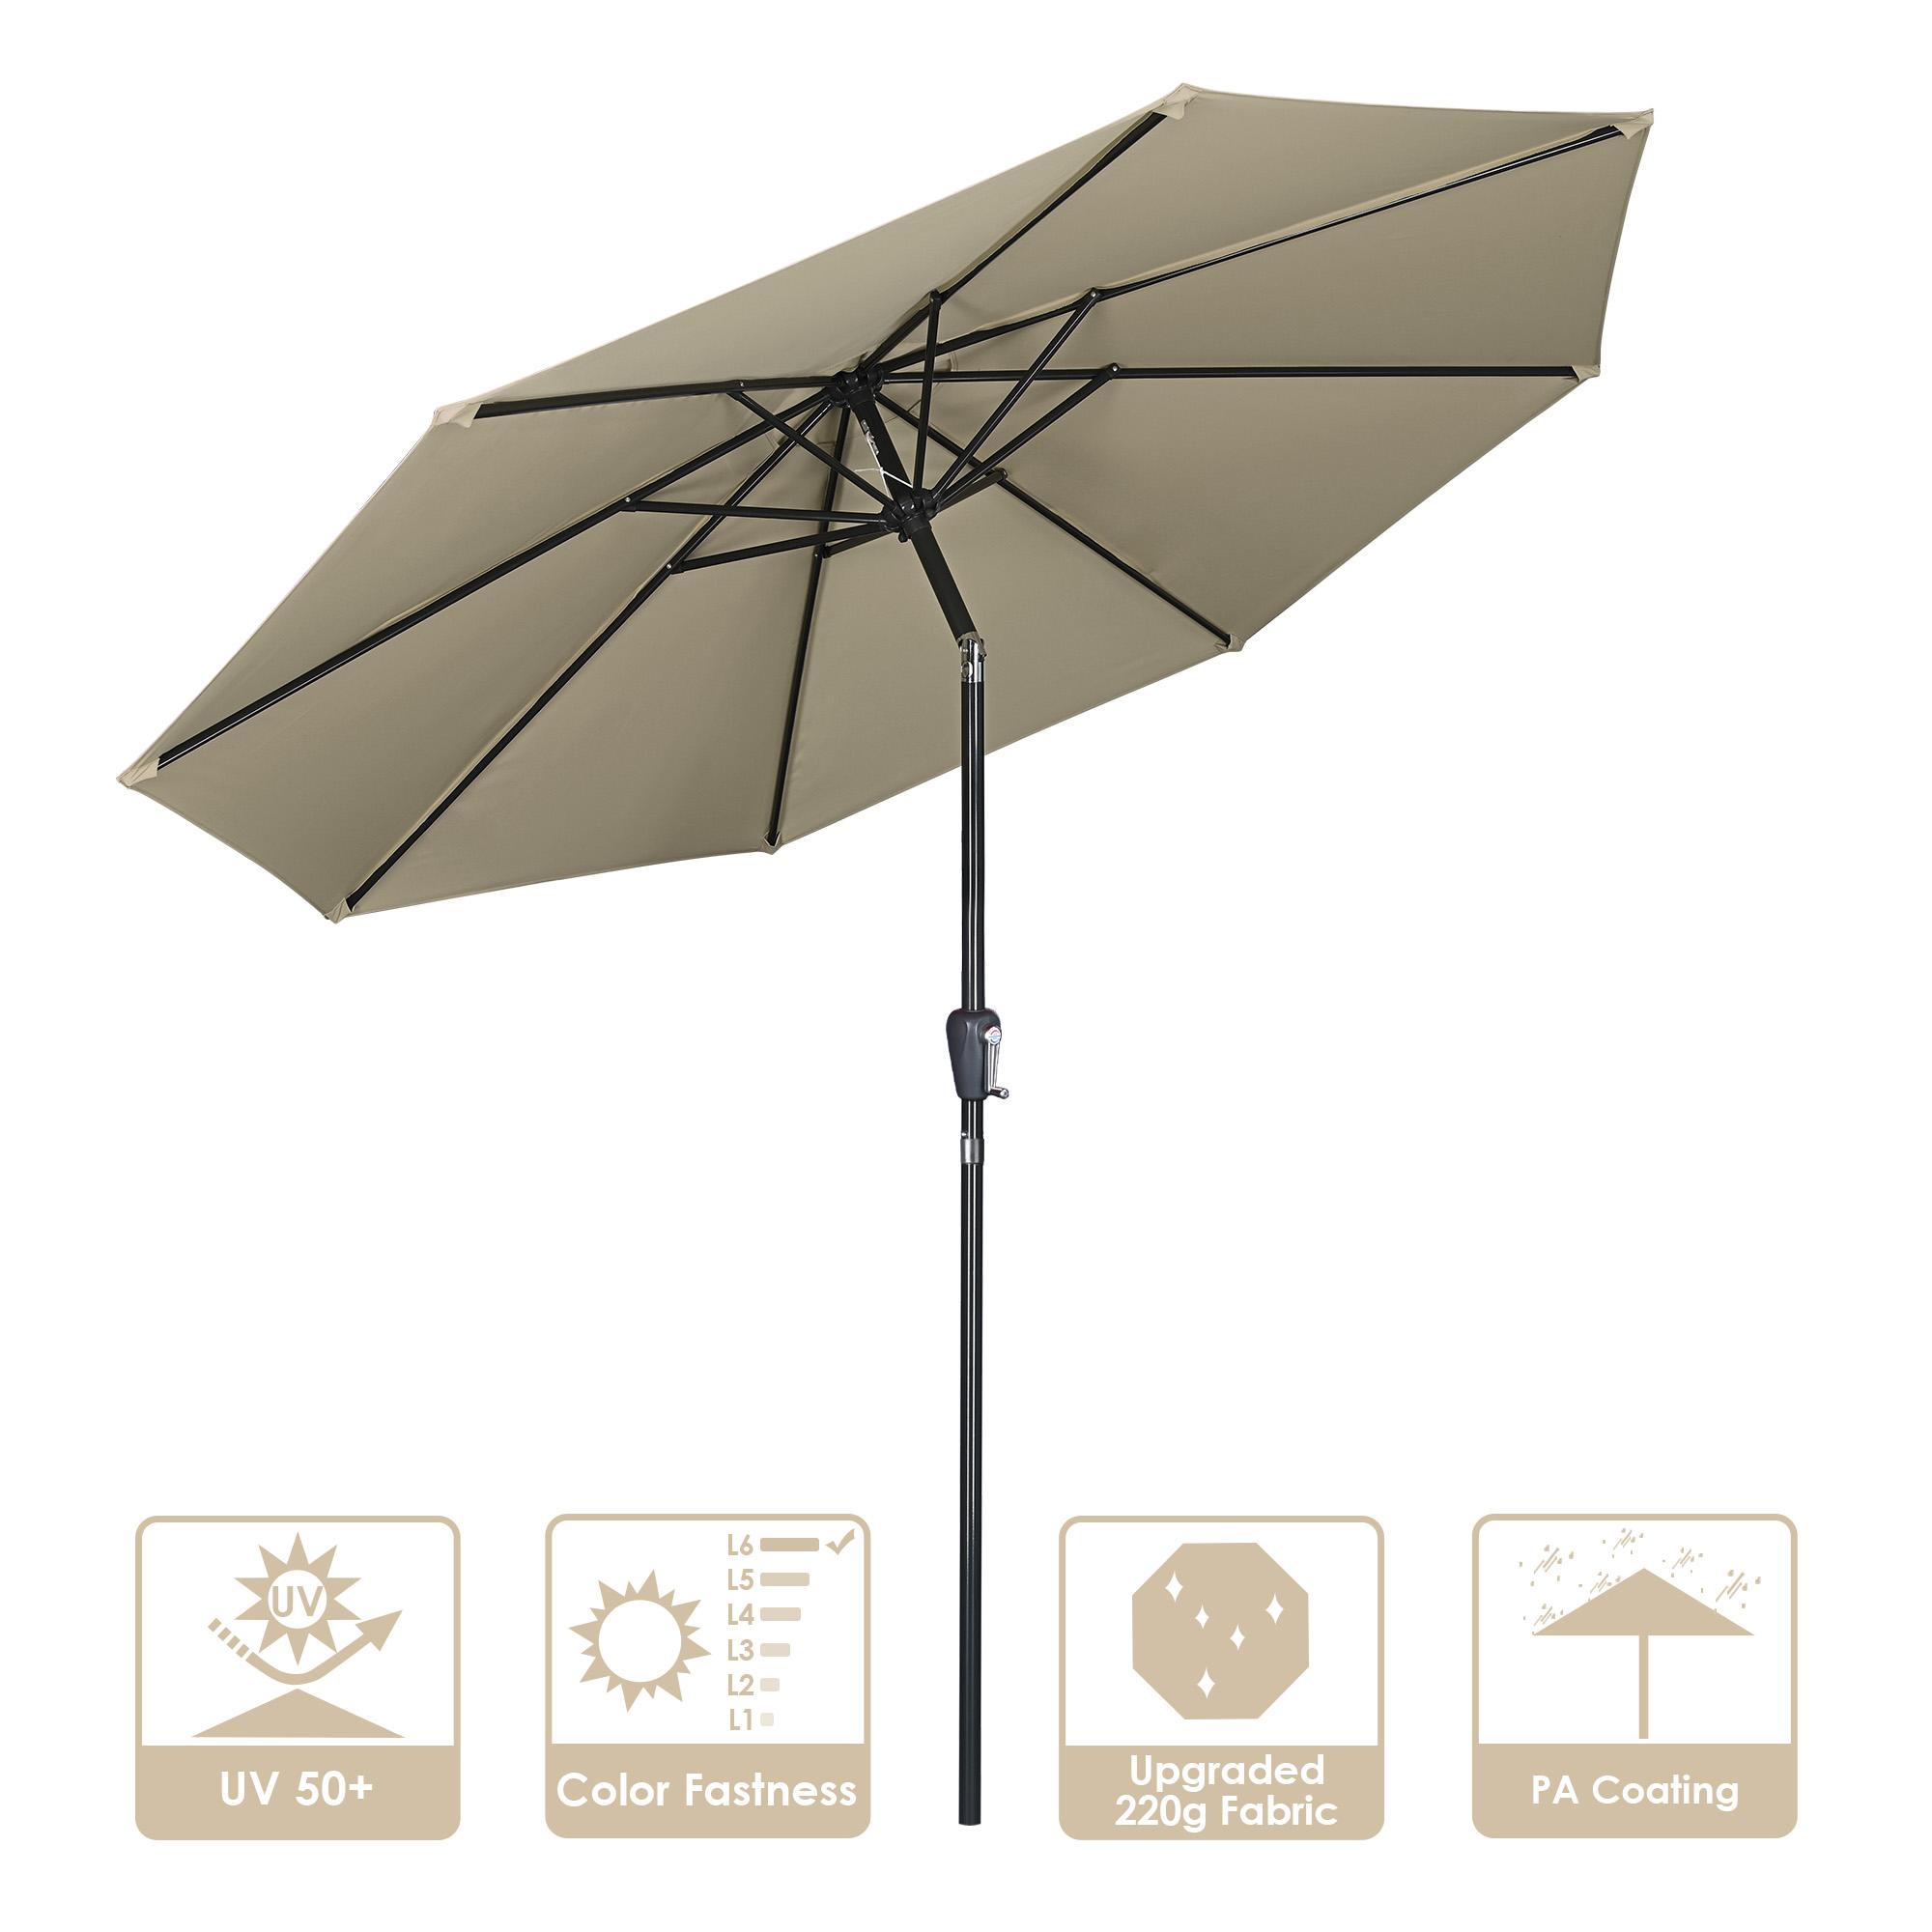 9FT 铝杆铁骨伞,色织布